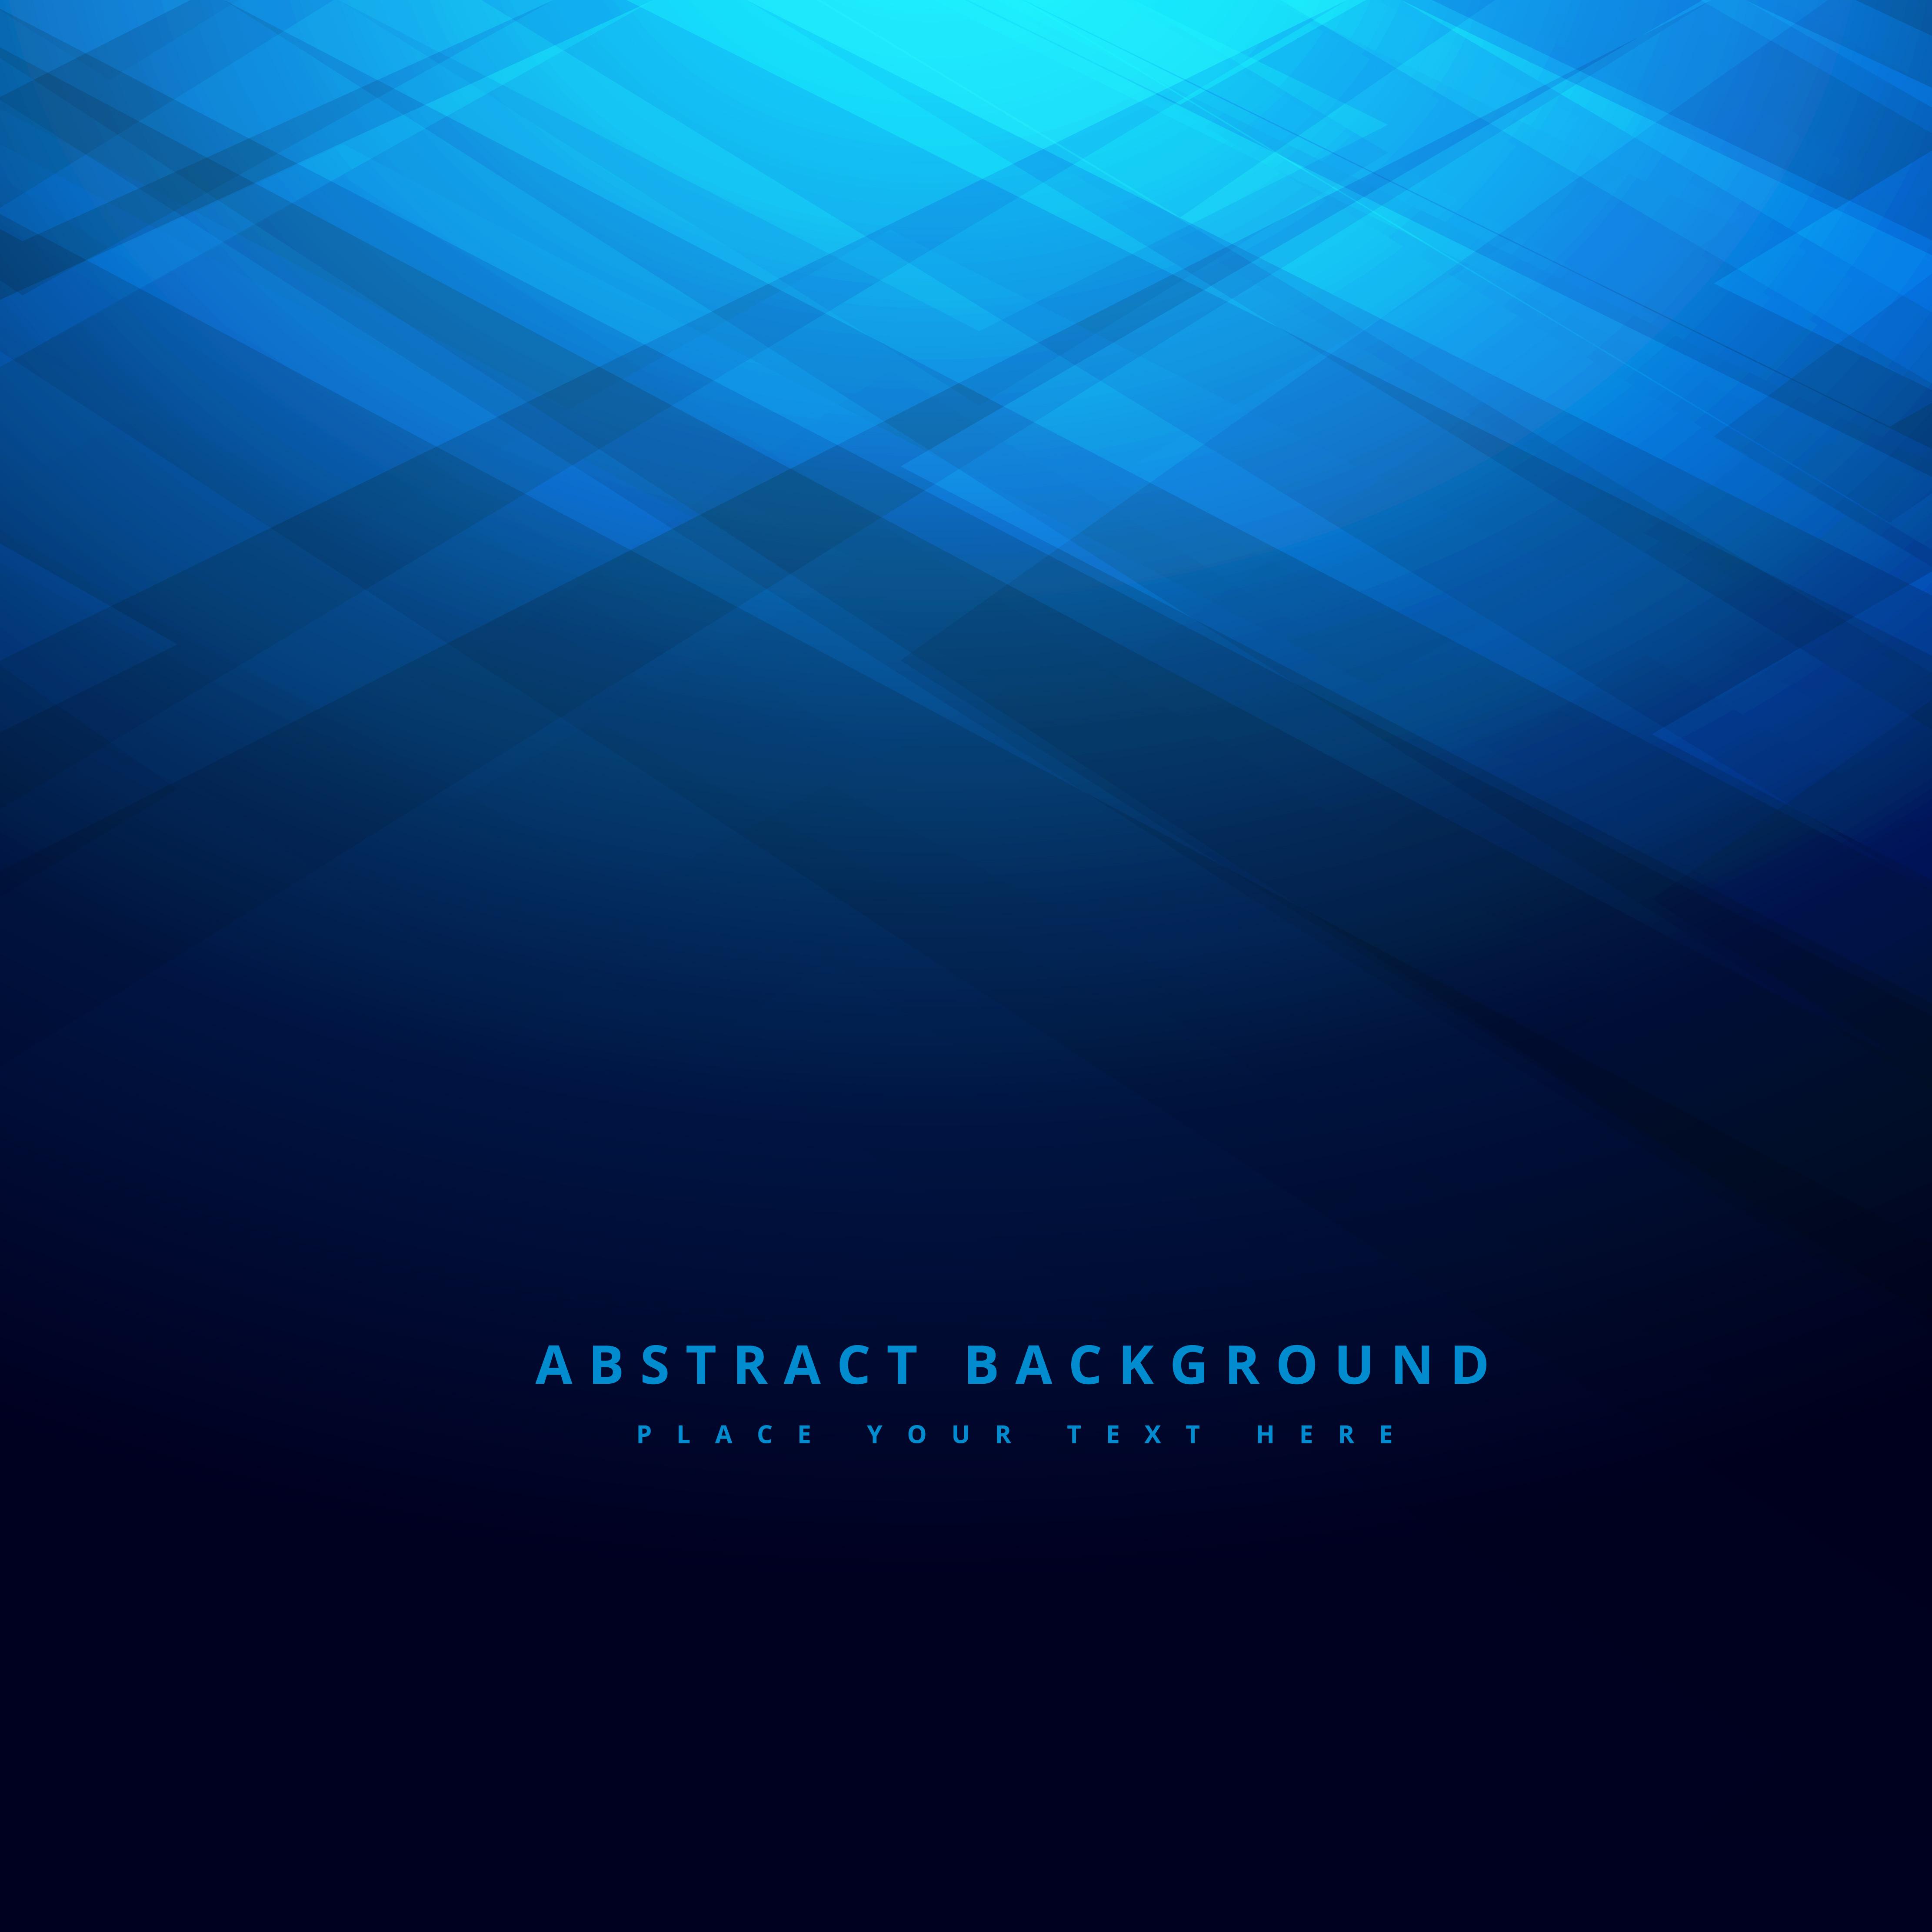 Abstract Underwater Blue Background